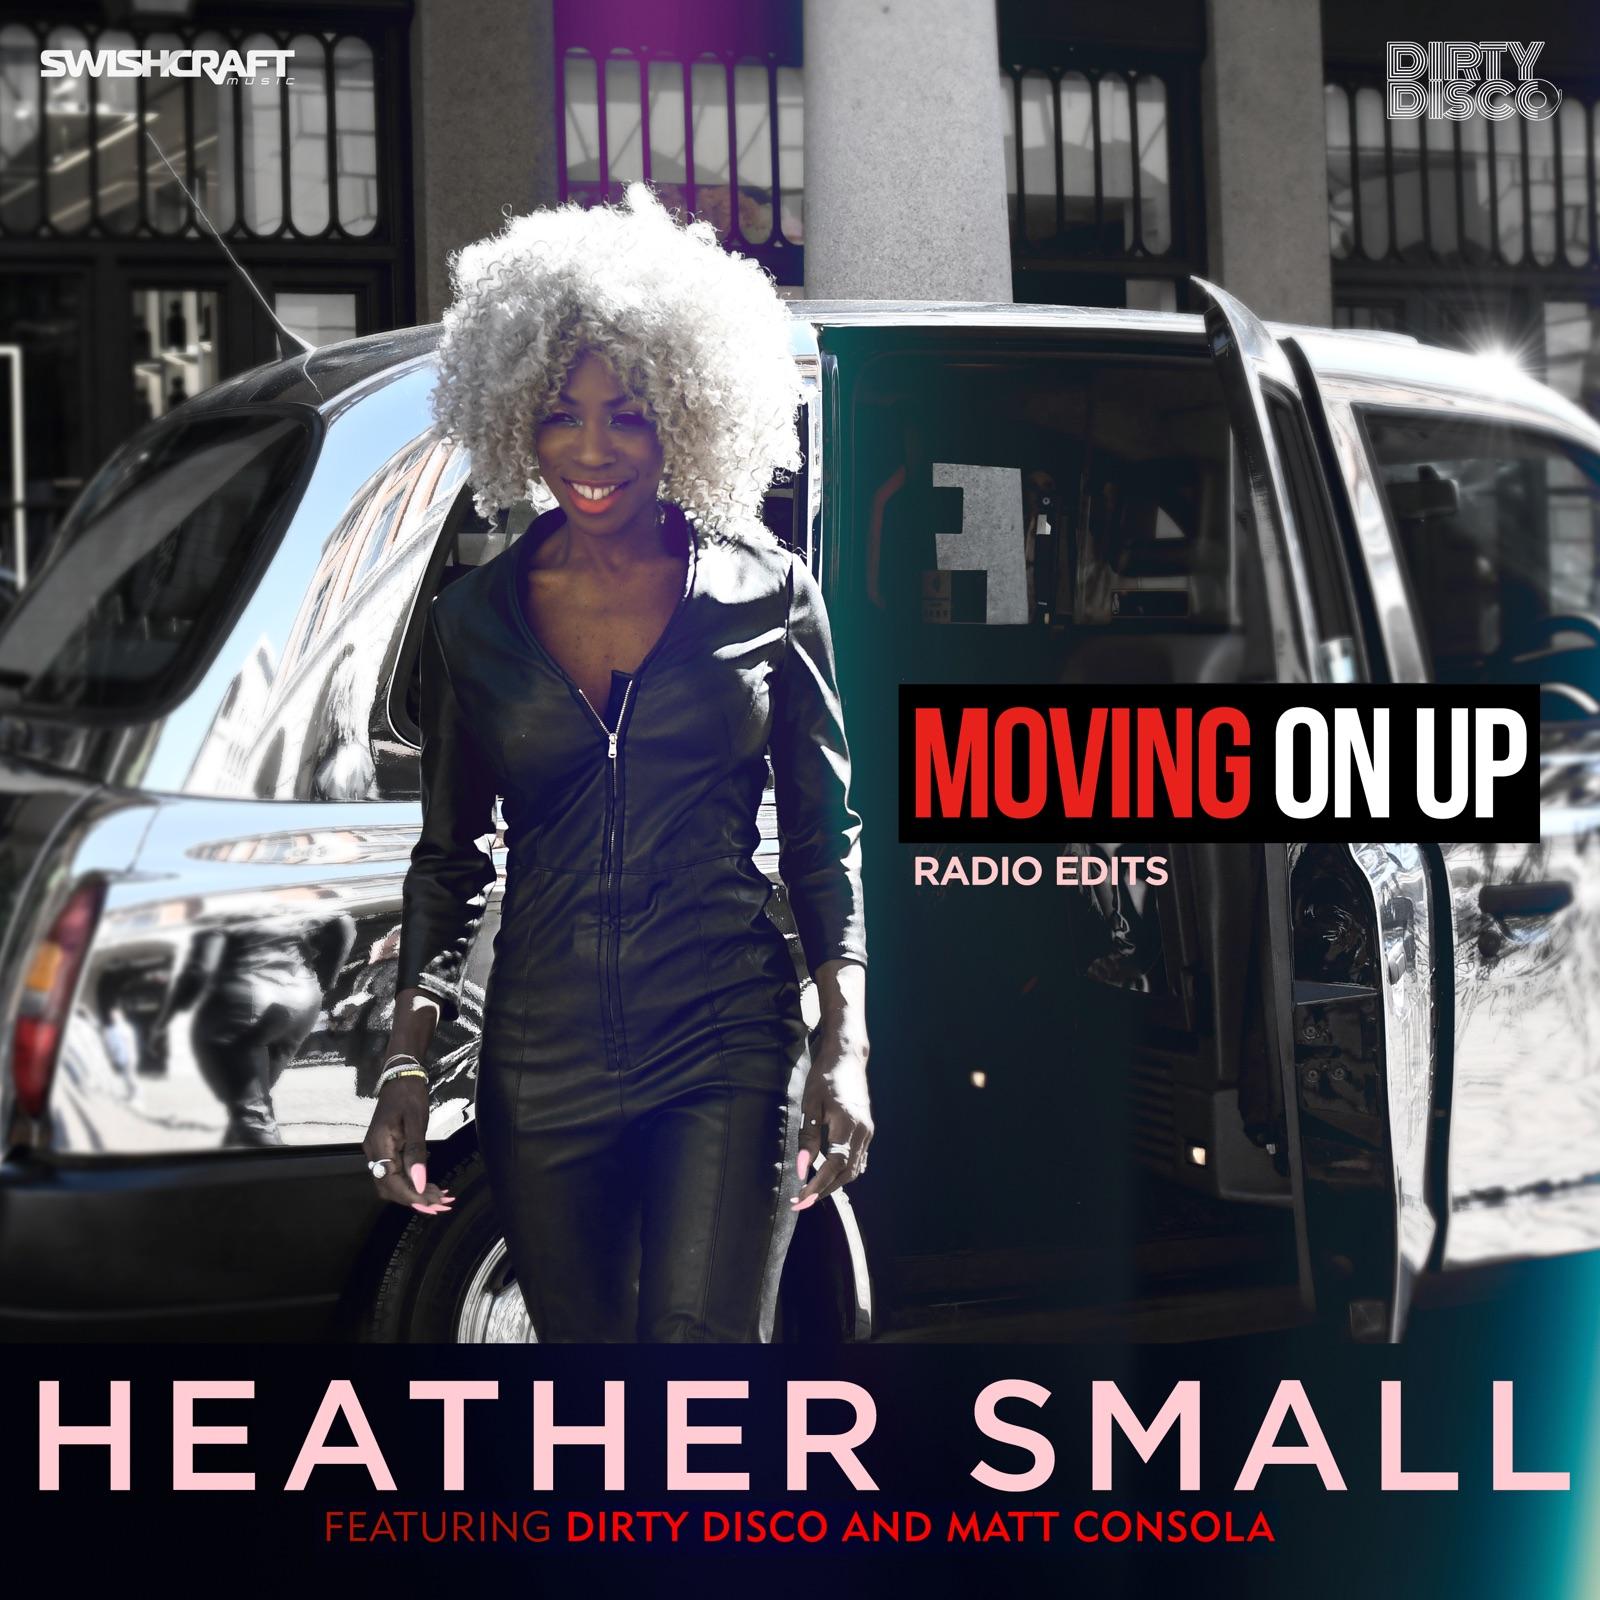 Moving On Up (Remixes Radio Edits)